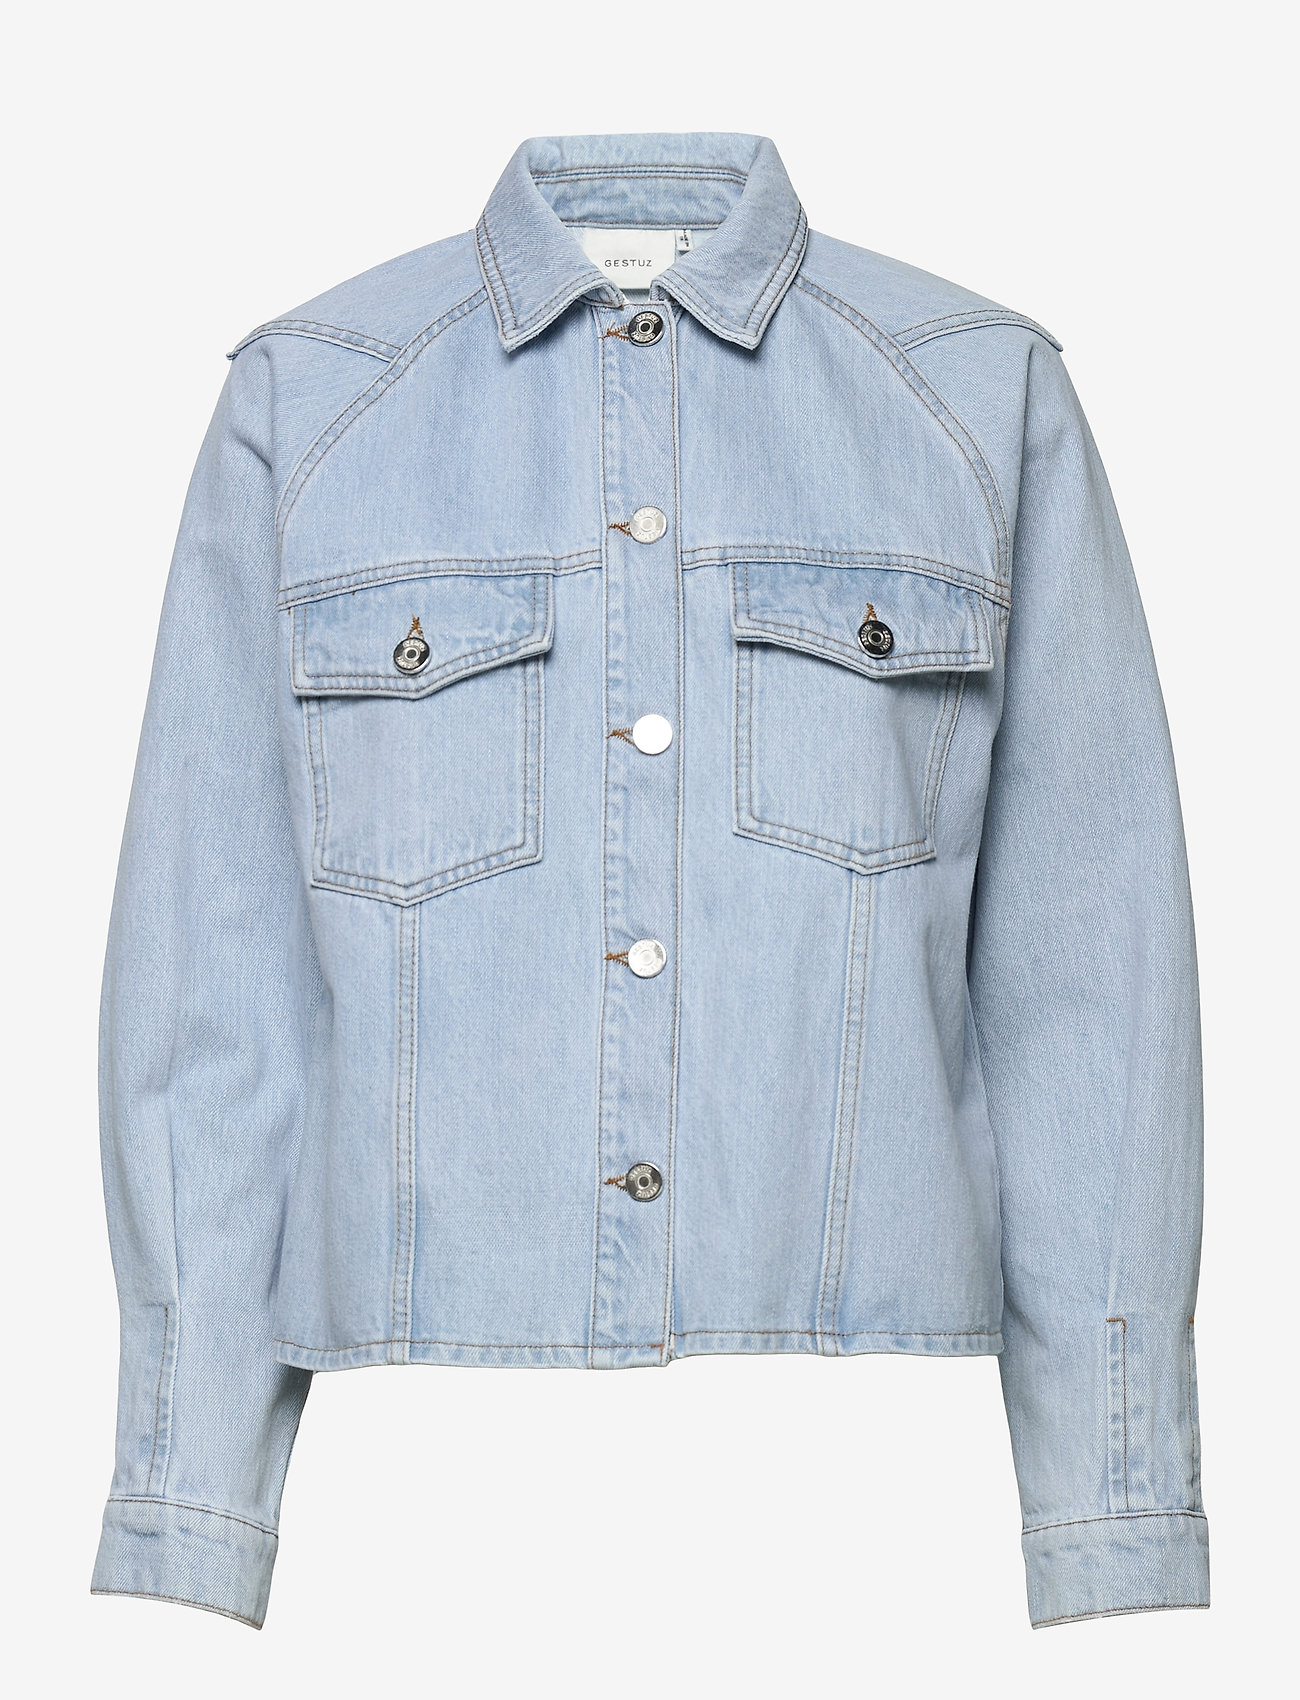 Gestuz - DacyGZ shirt - tøj - light blue vintage - 1